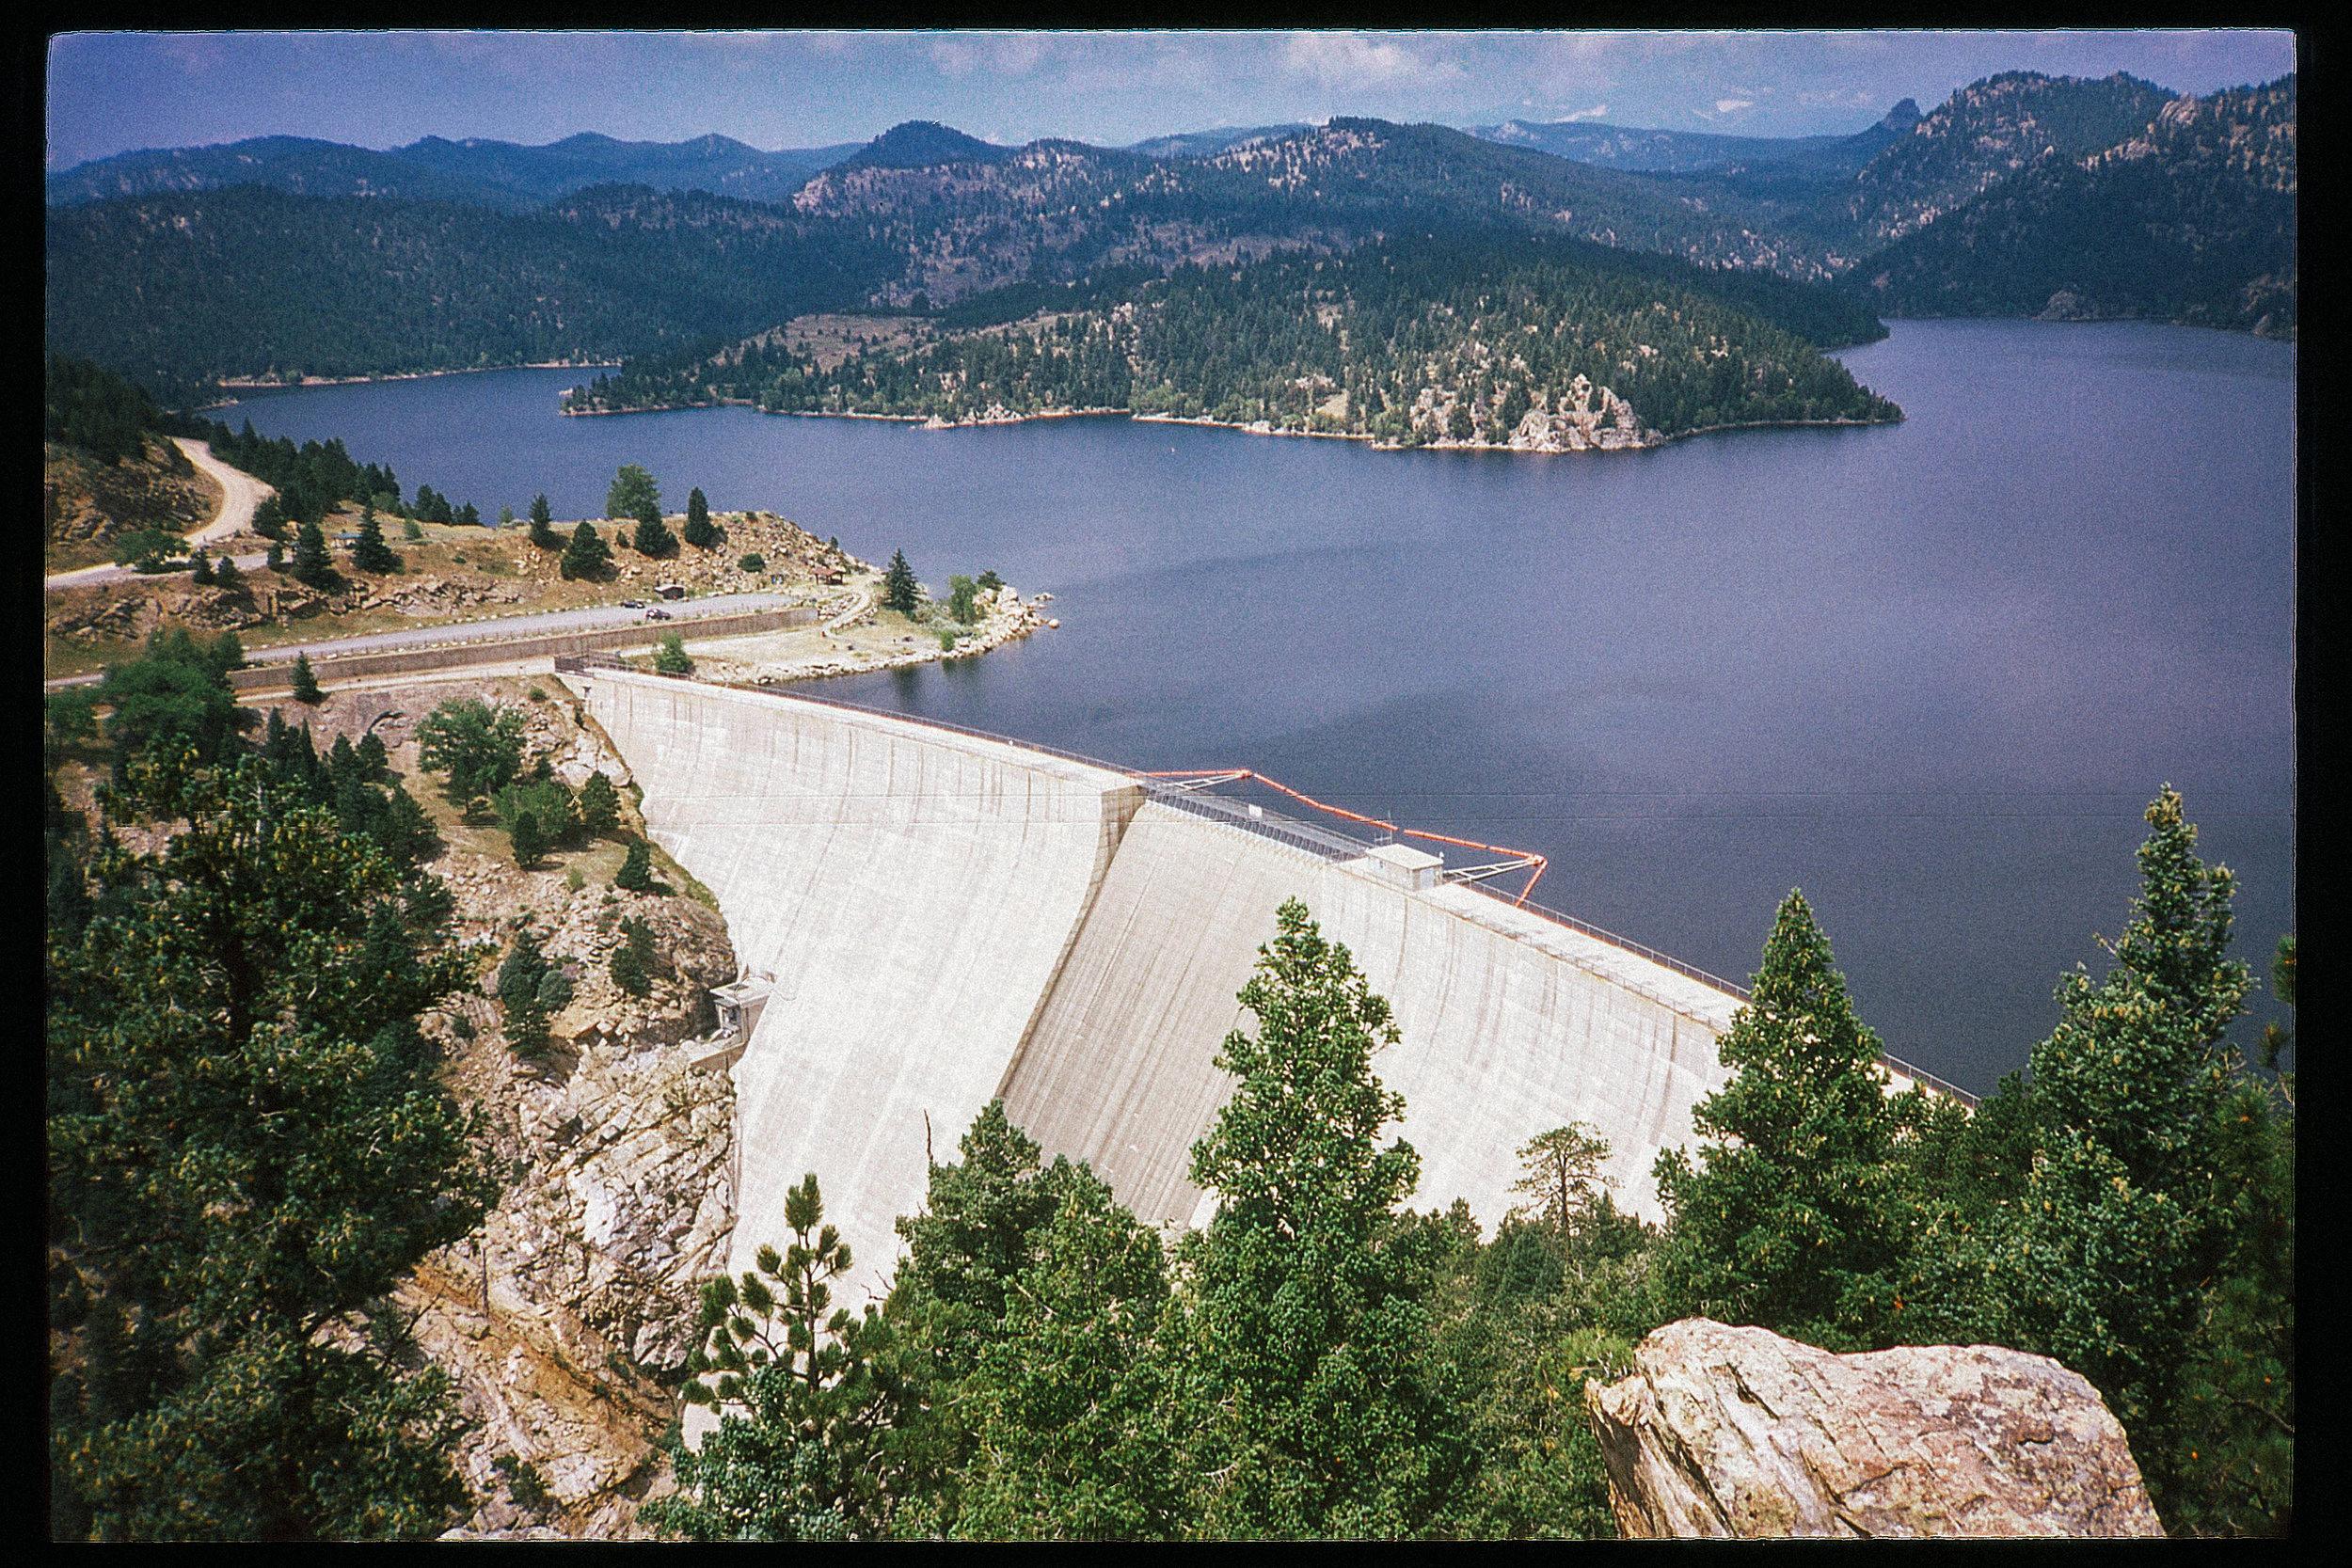 Olympus XA - Provia - Gross Reservoir edit 2.jpg